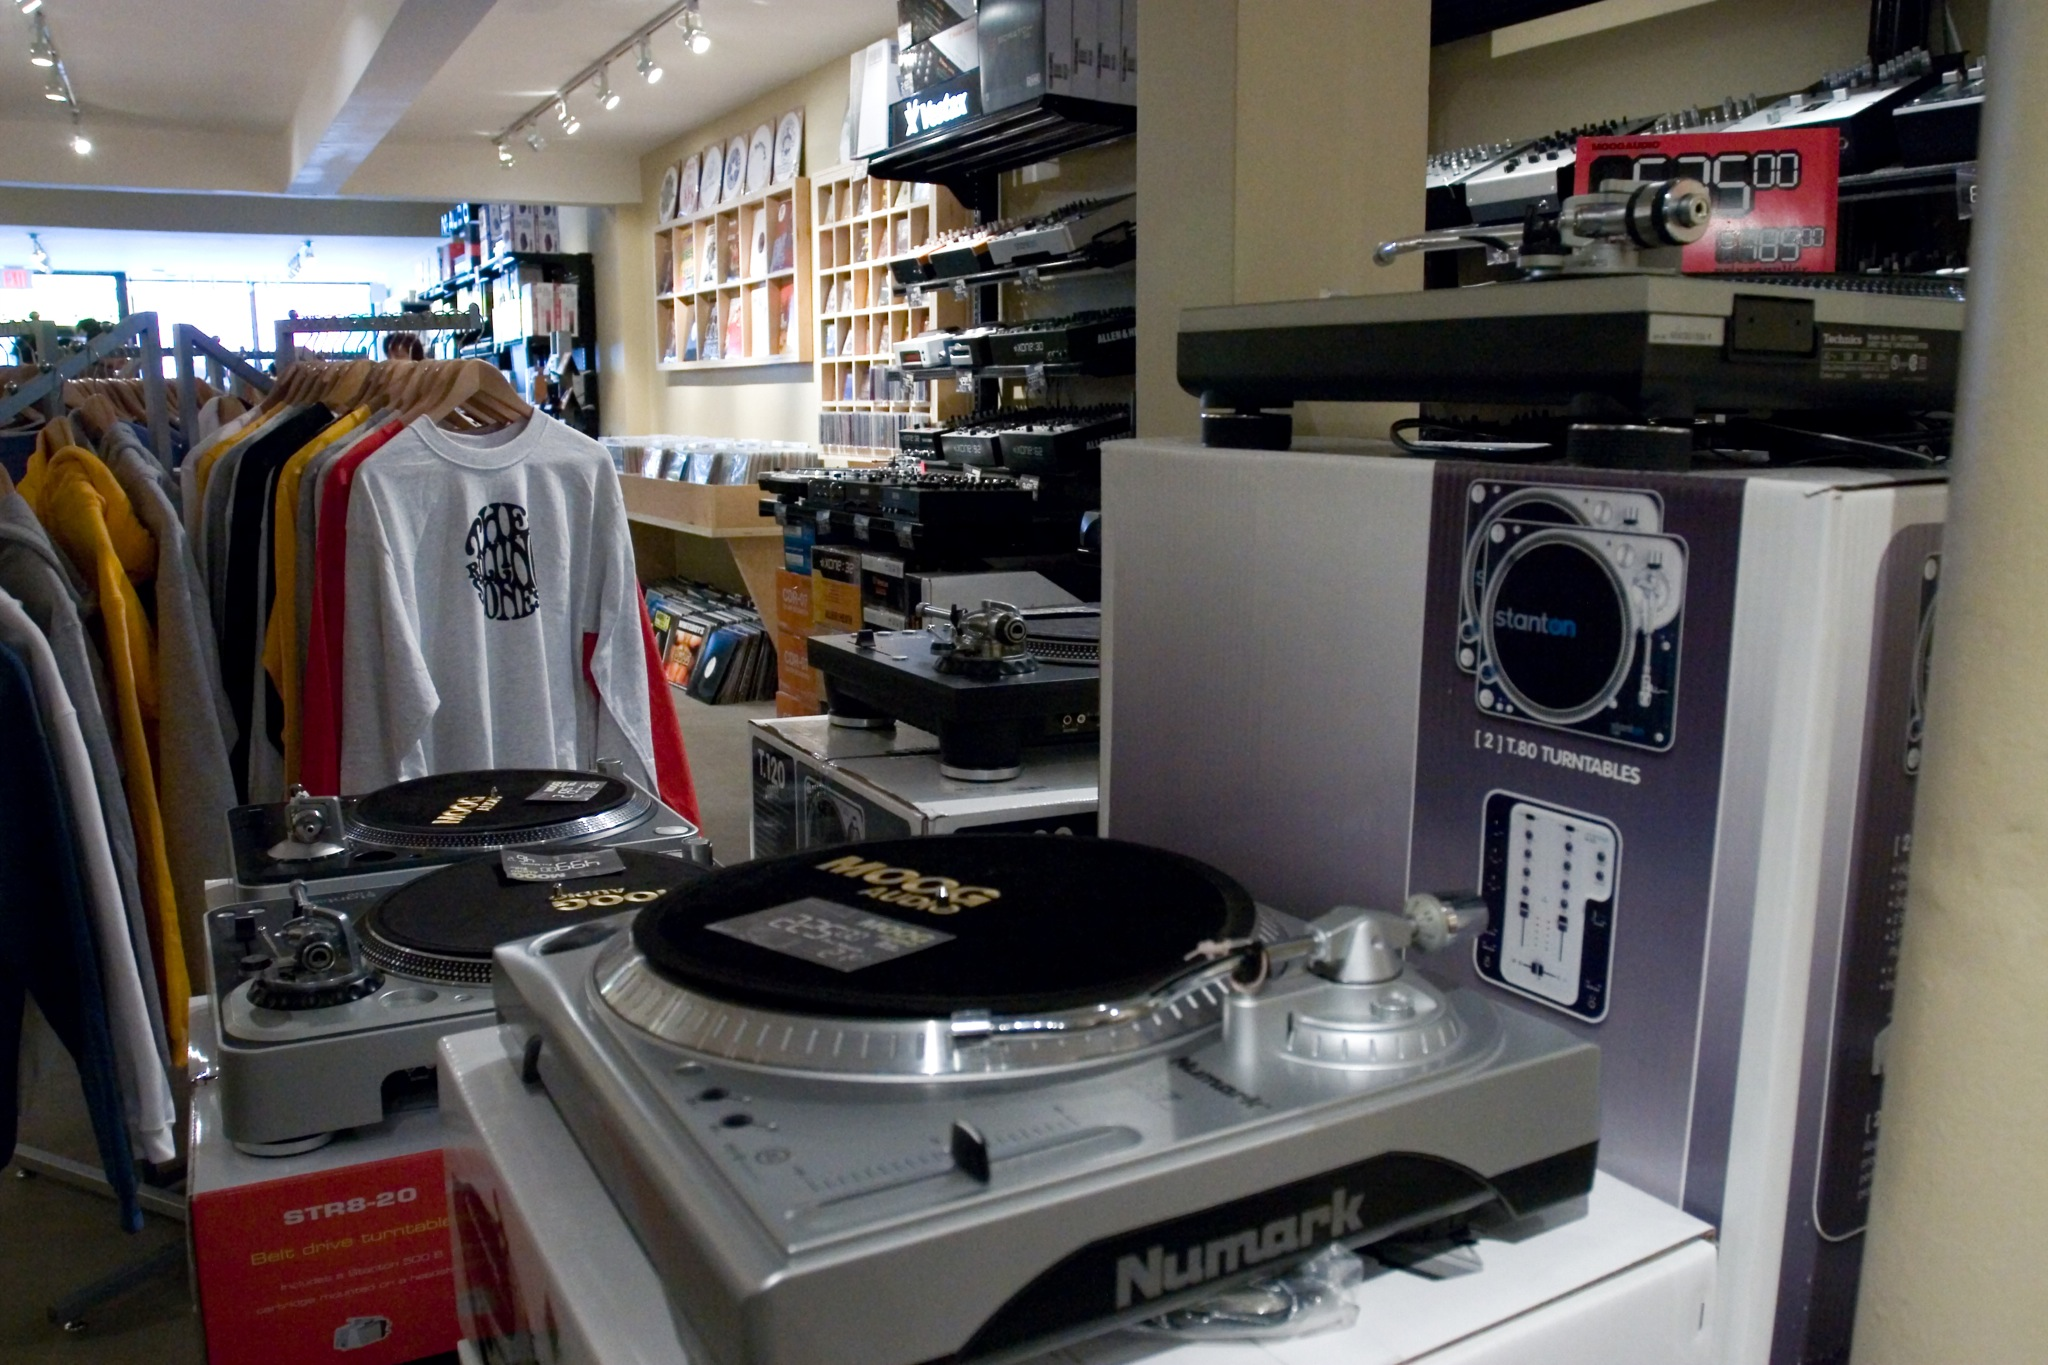 File:Moog Audio (shop) DJ gears, Montreal, Canada jpg